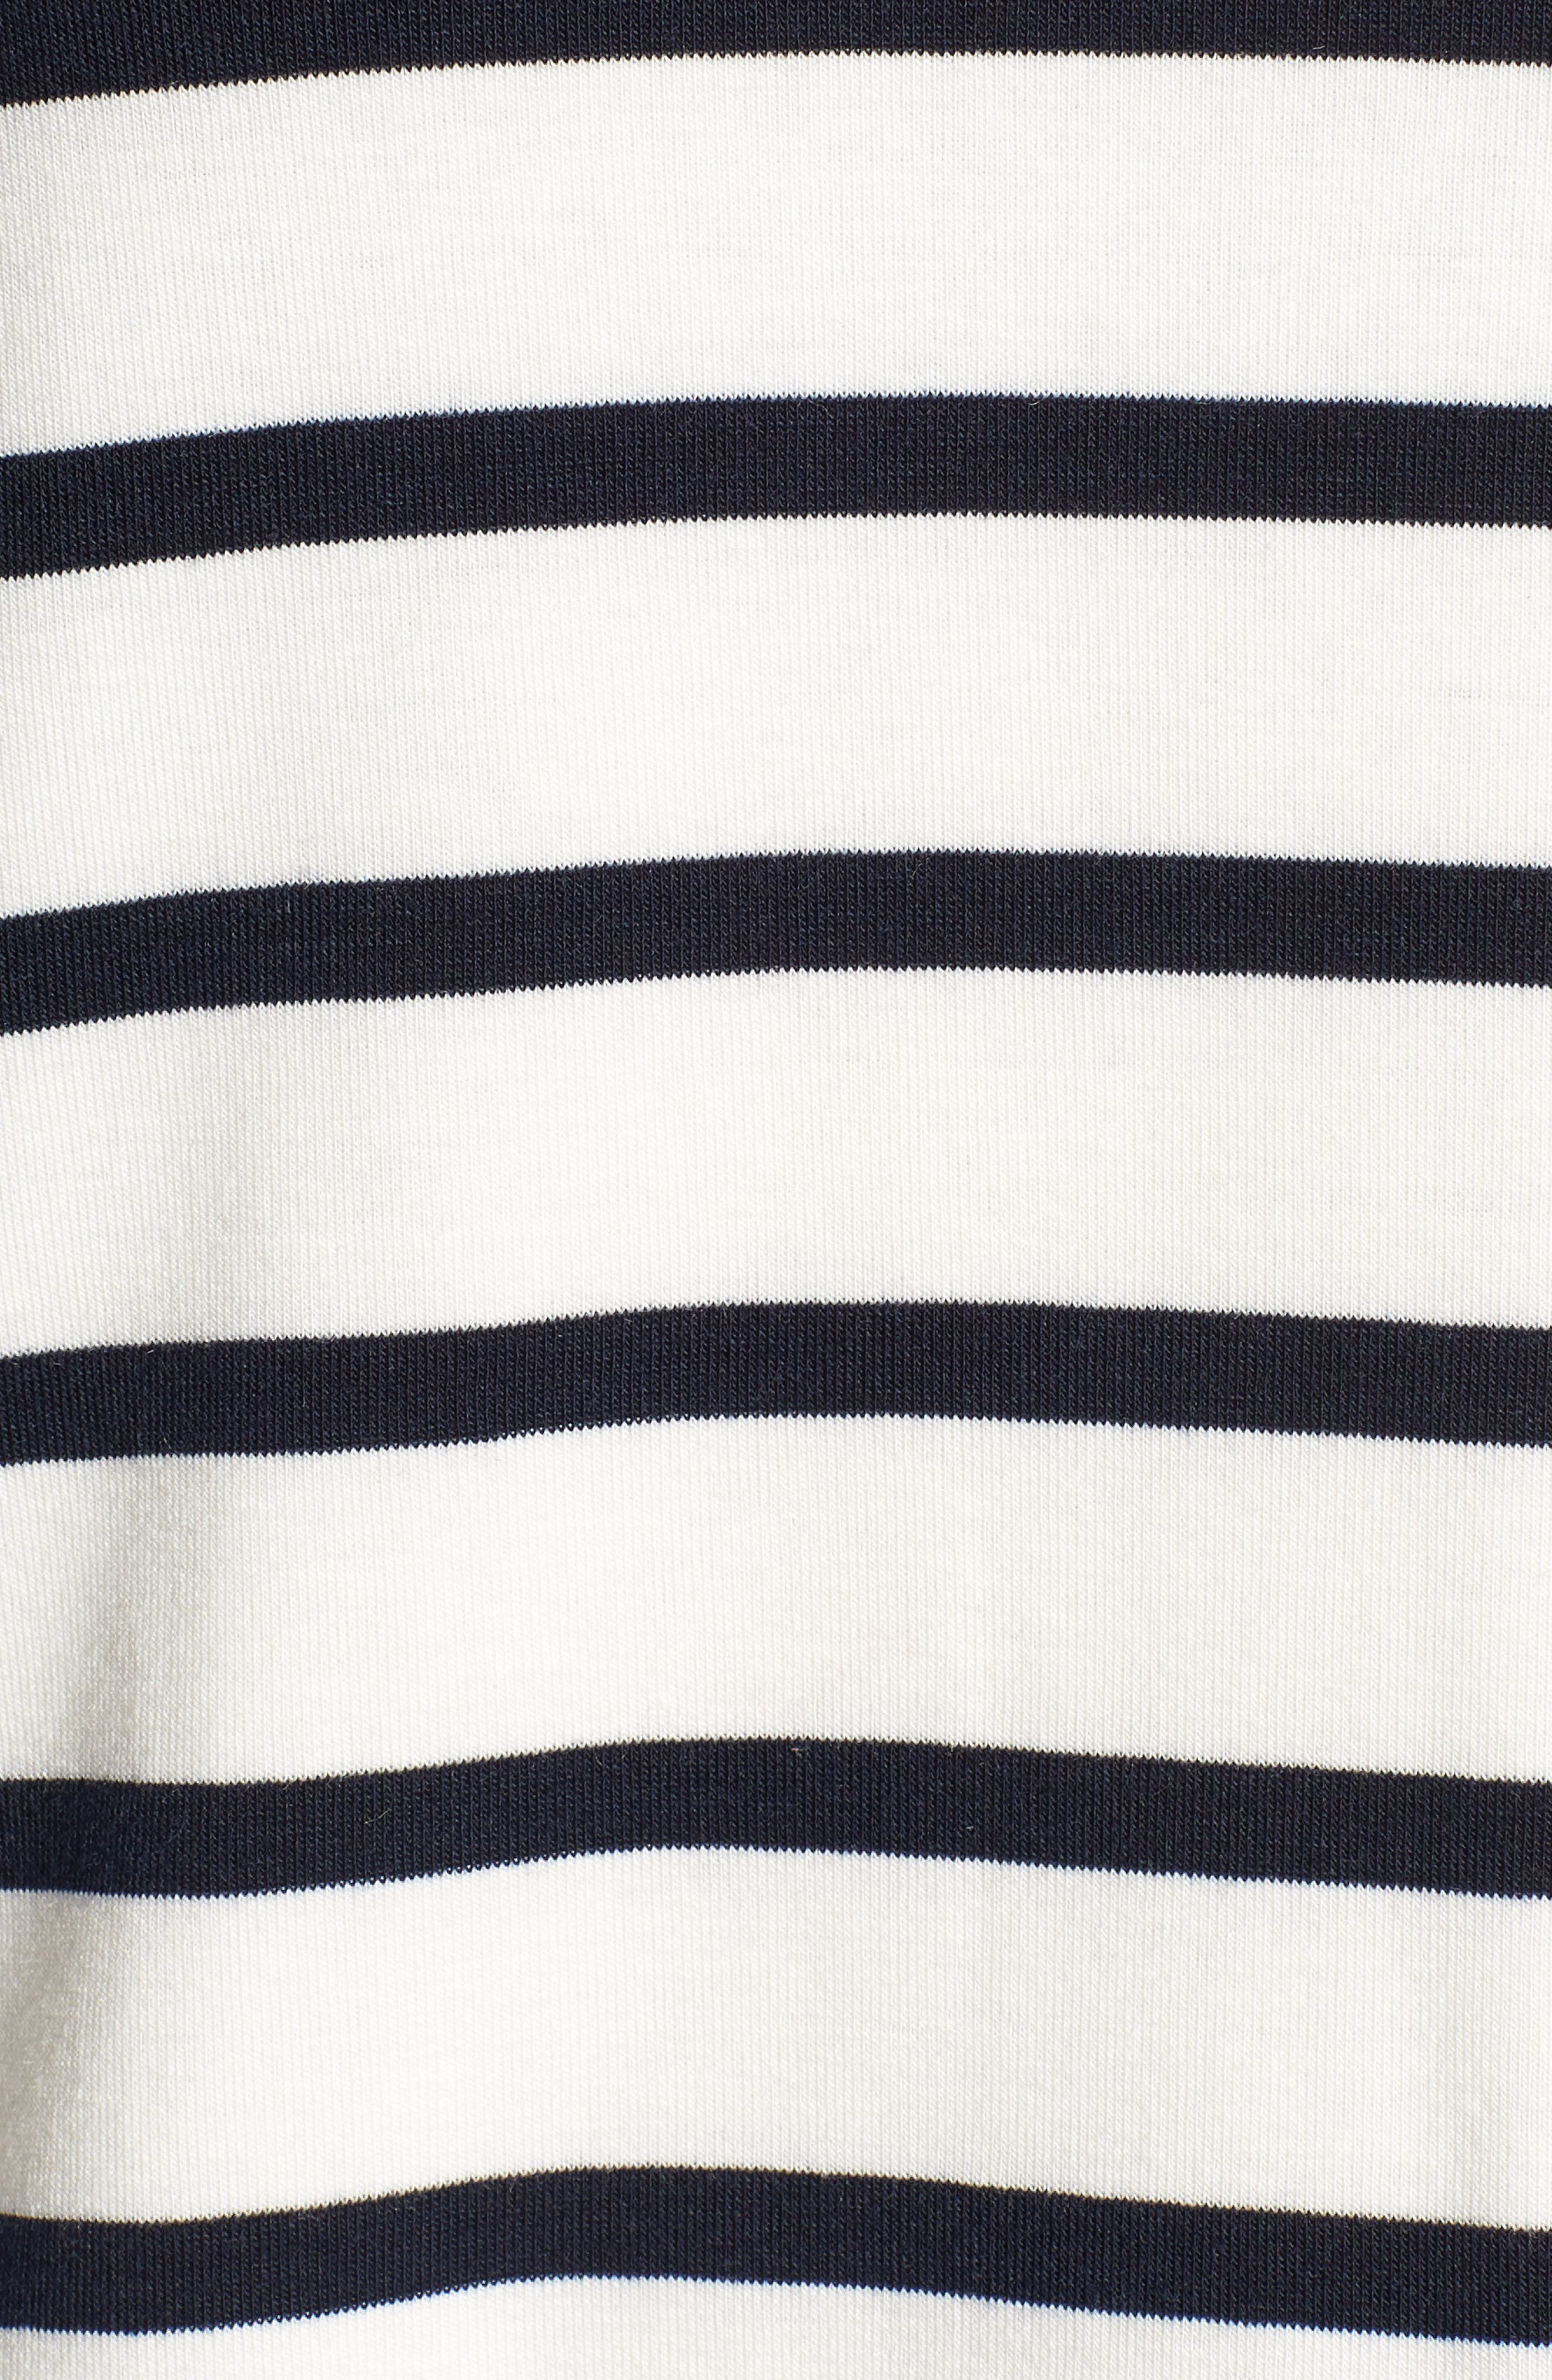 Bishop + Young Stripe Lace-Up Back Top,                             Alternate thumbnail 6, color,                             Black Stripe